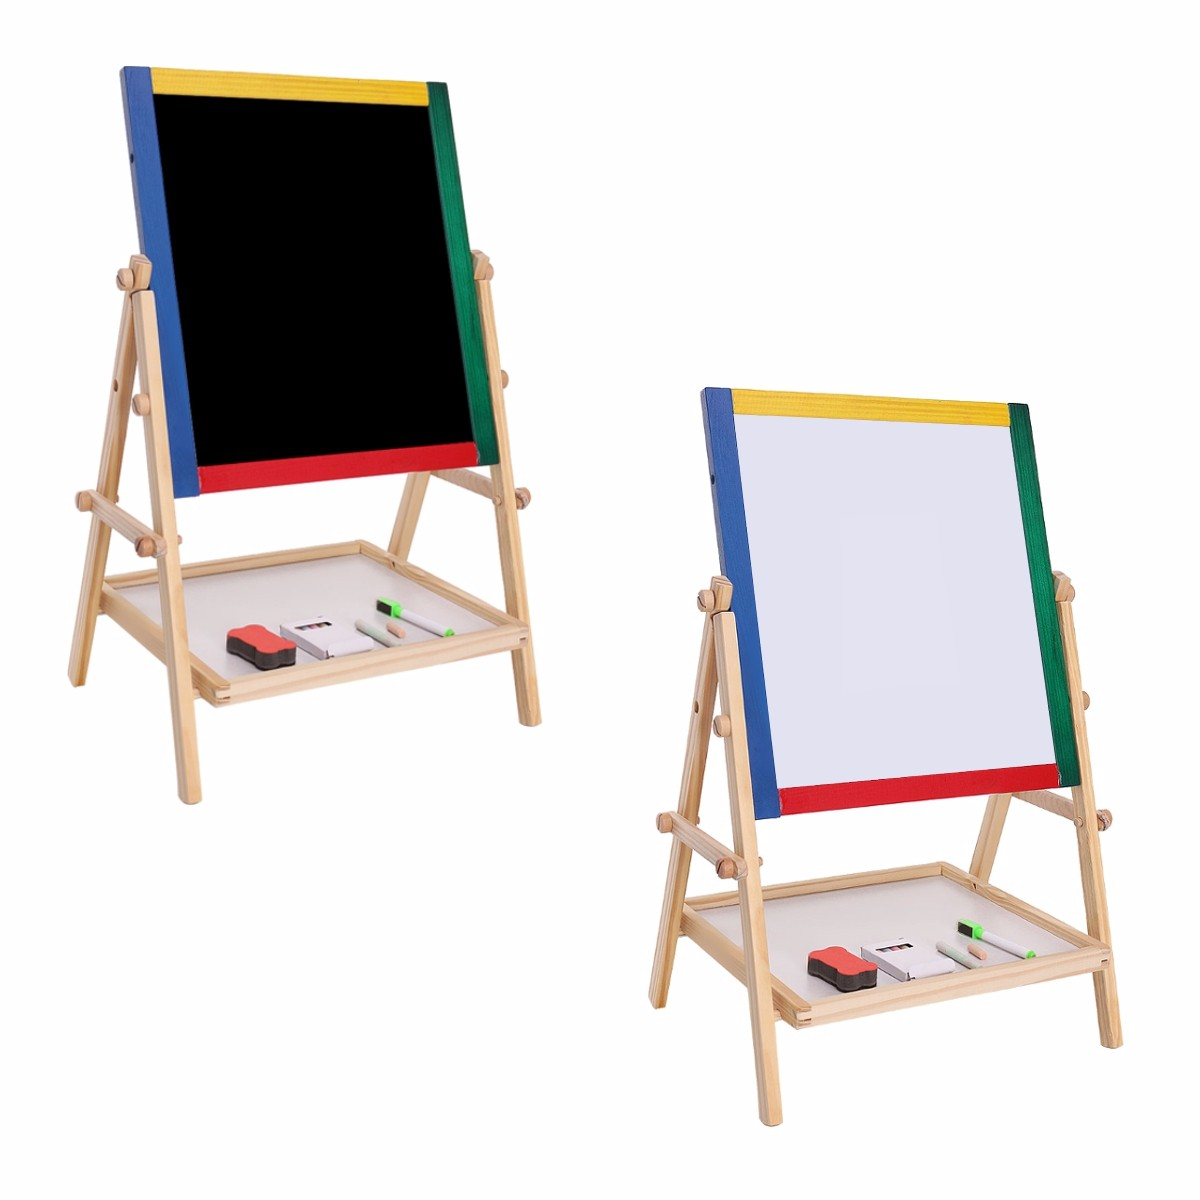 drawing board educational toy for children adjustable children kids 2 in 1 black white wooden. Black Bedroom Furniture Sets. Home Design Ideas